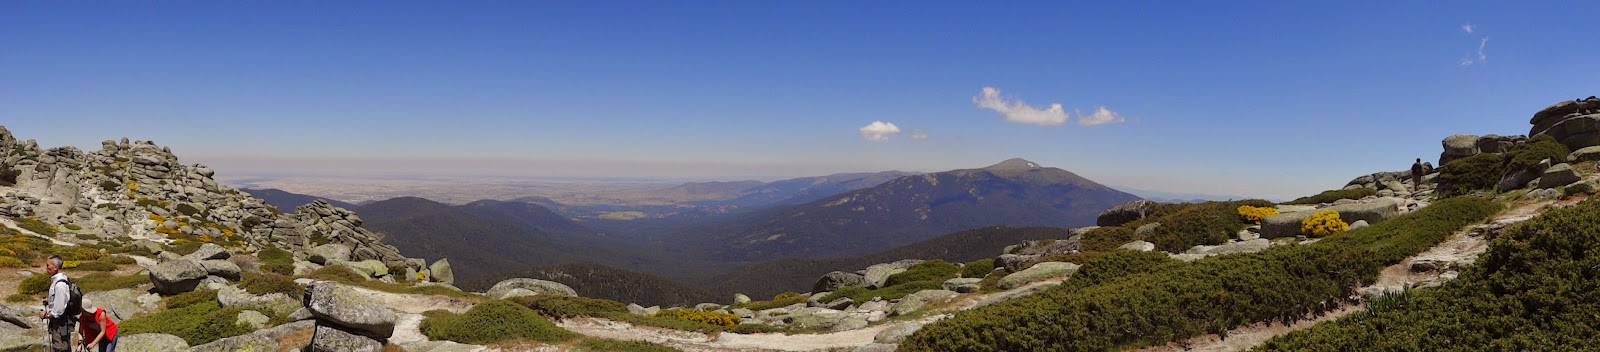 Panorámica desde Siete Picos